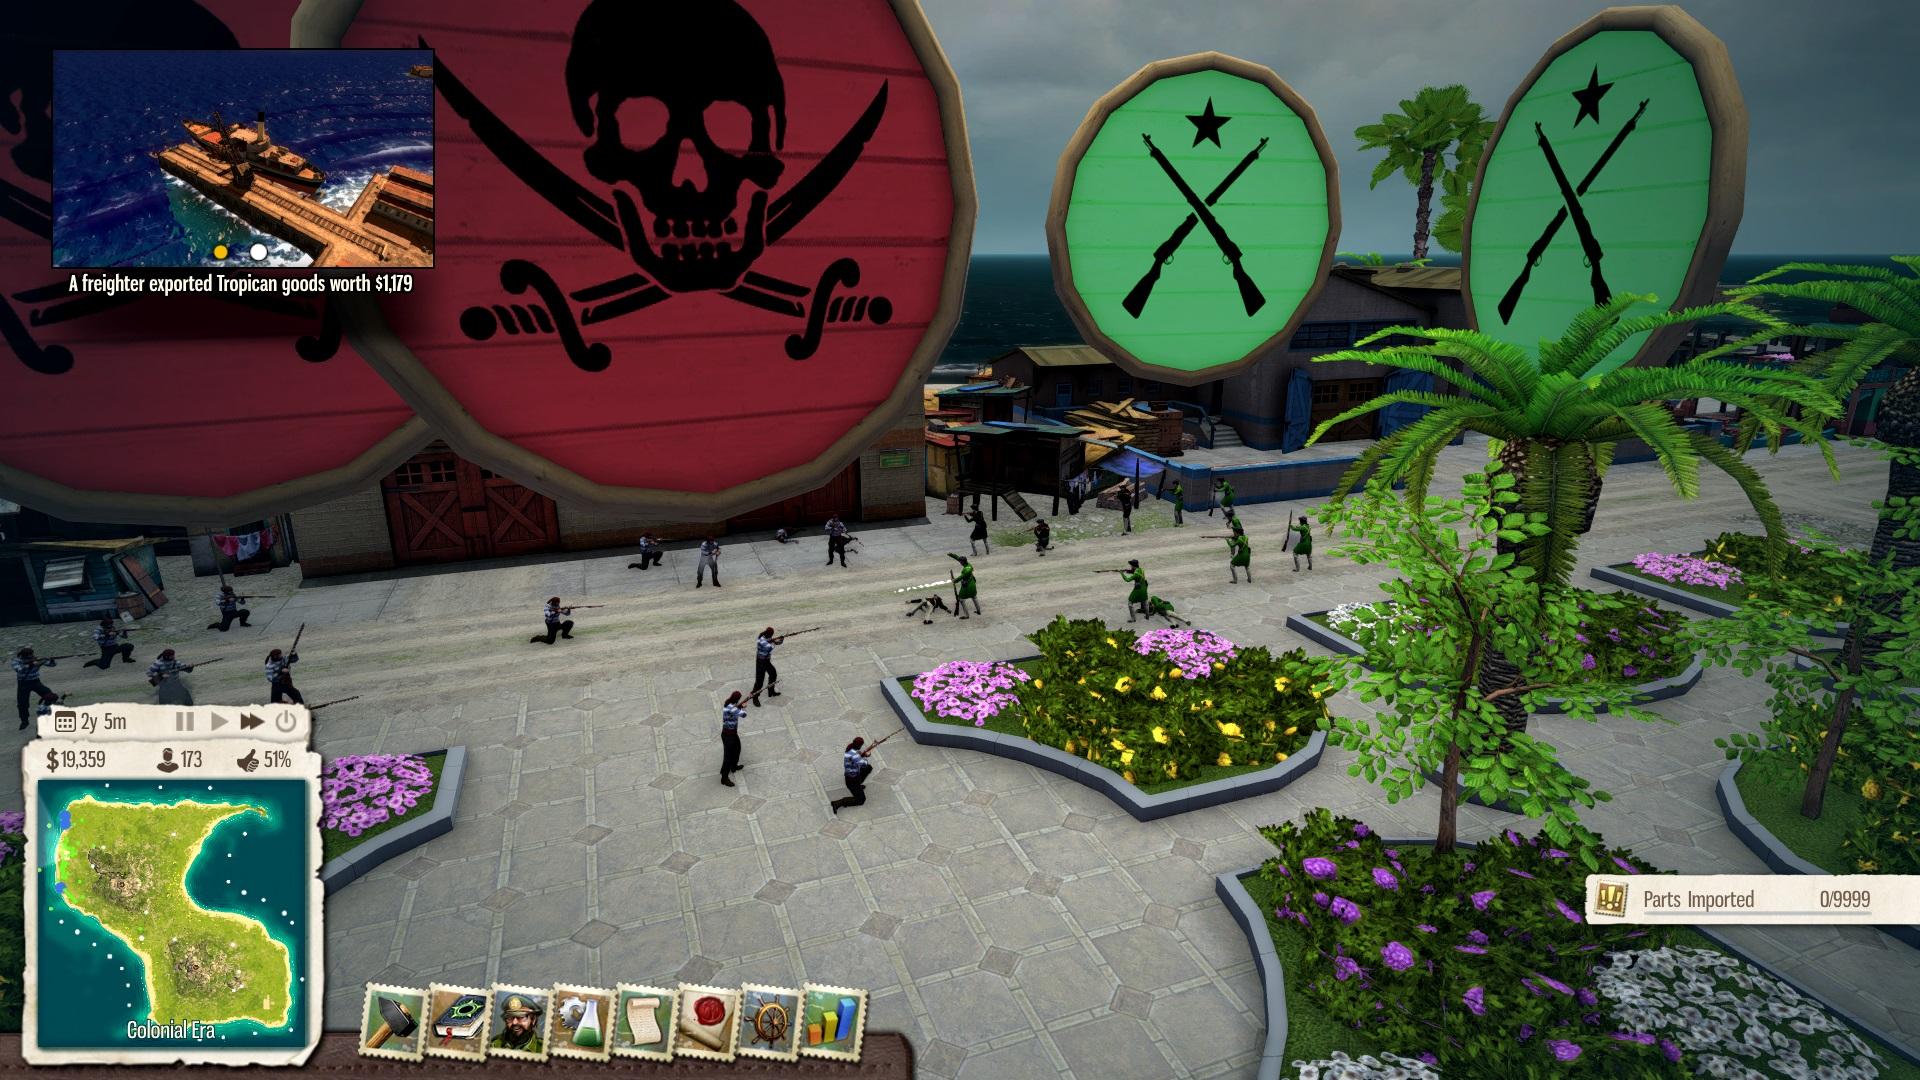 tropico-5-Waterborne-free-game-pc-version